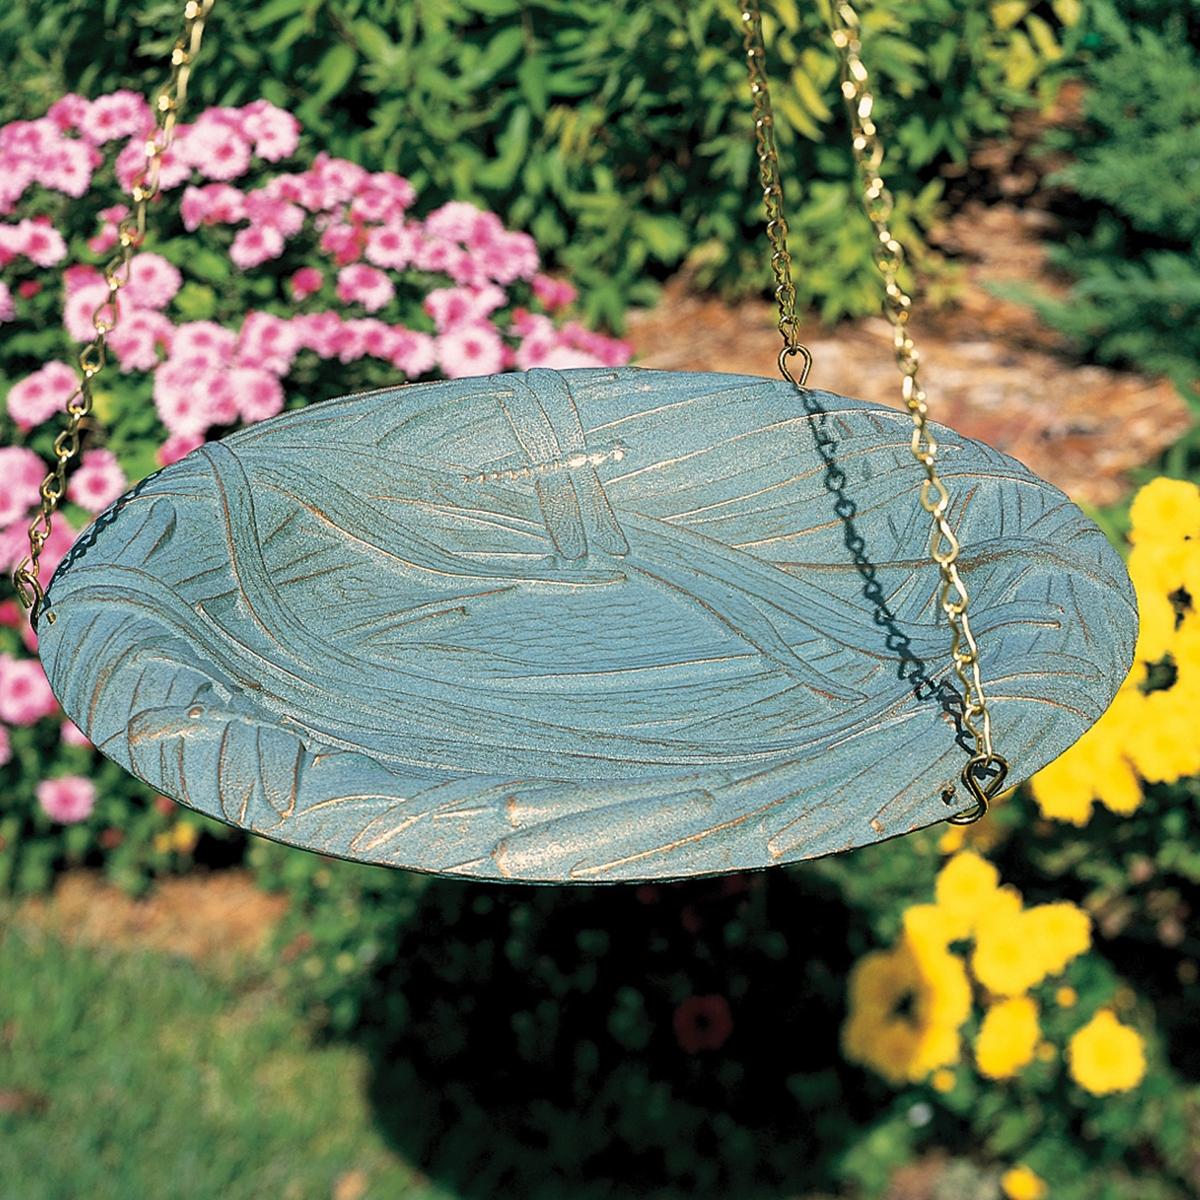 Dragonfly Hanging Birdbath